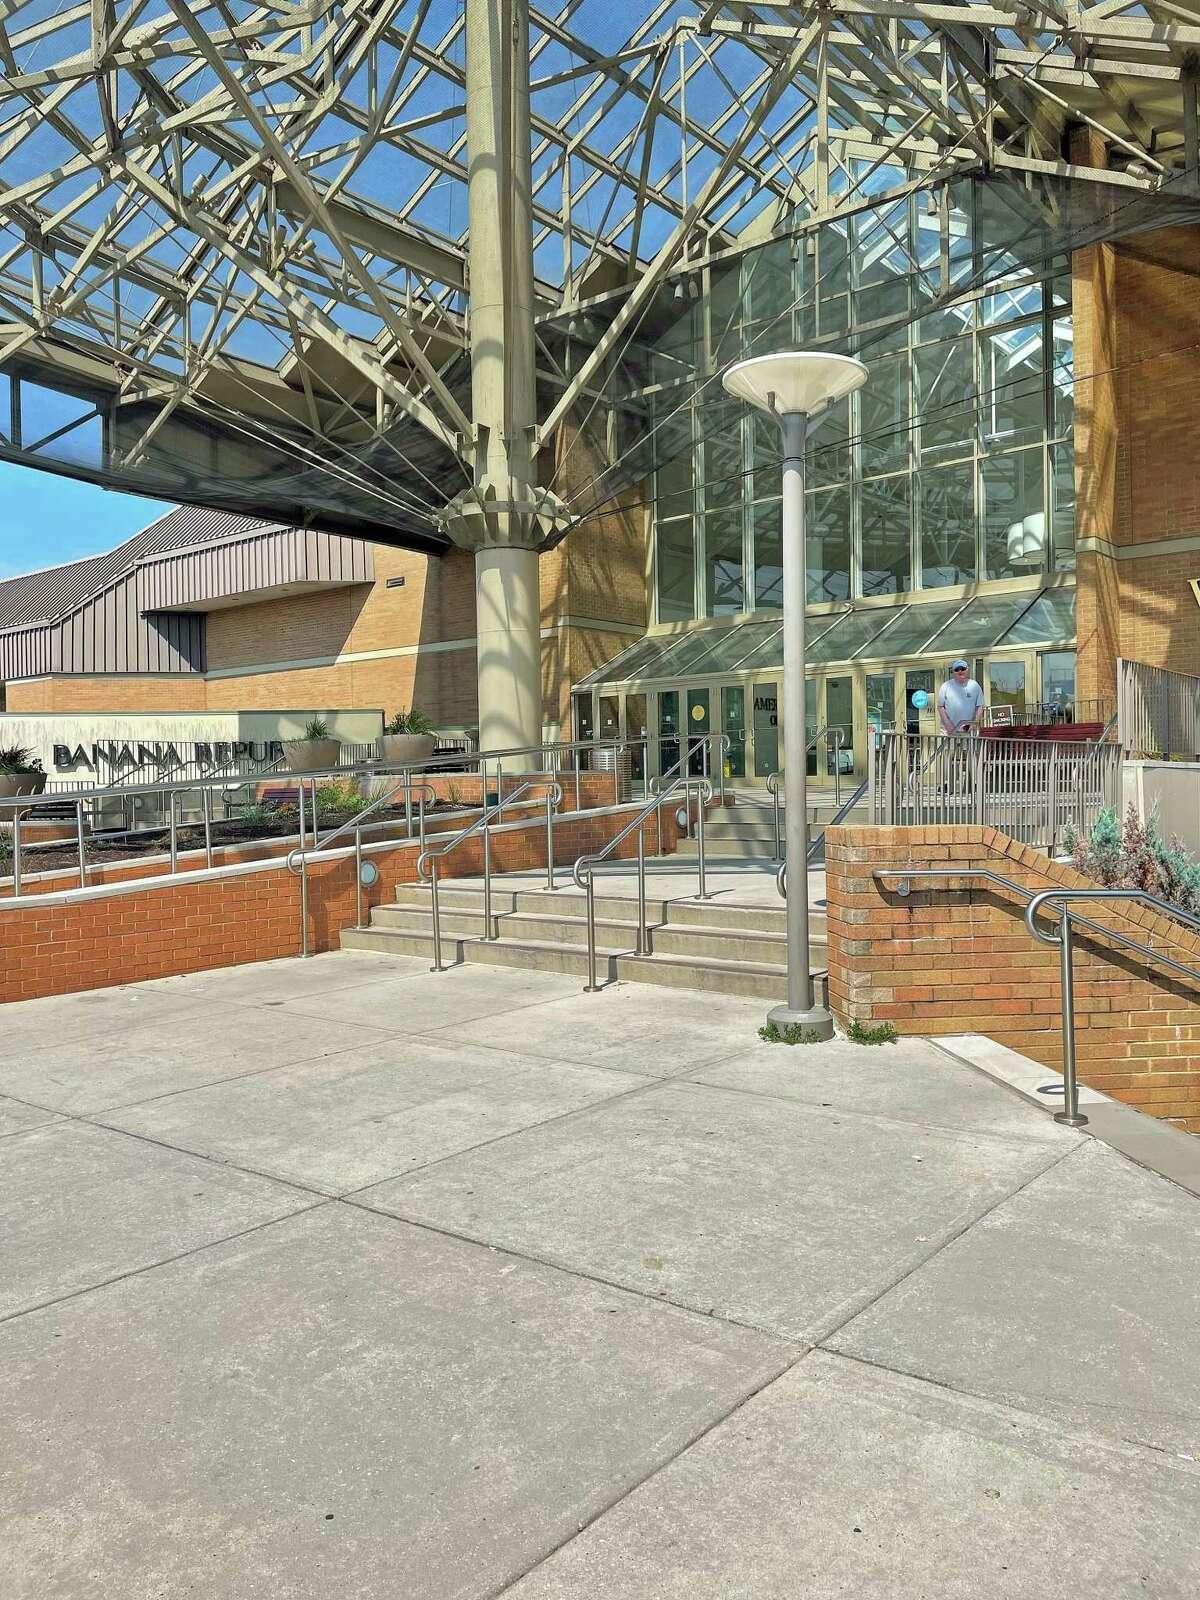 The exterior of the Danbury Fair mall in Danbury on Thursday, Aug. 12, 2021.